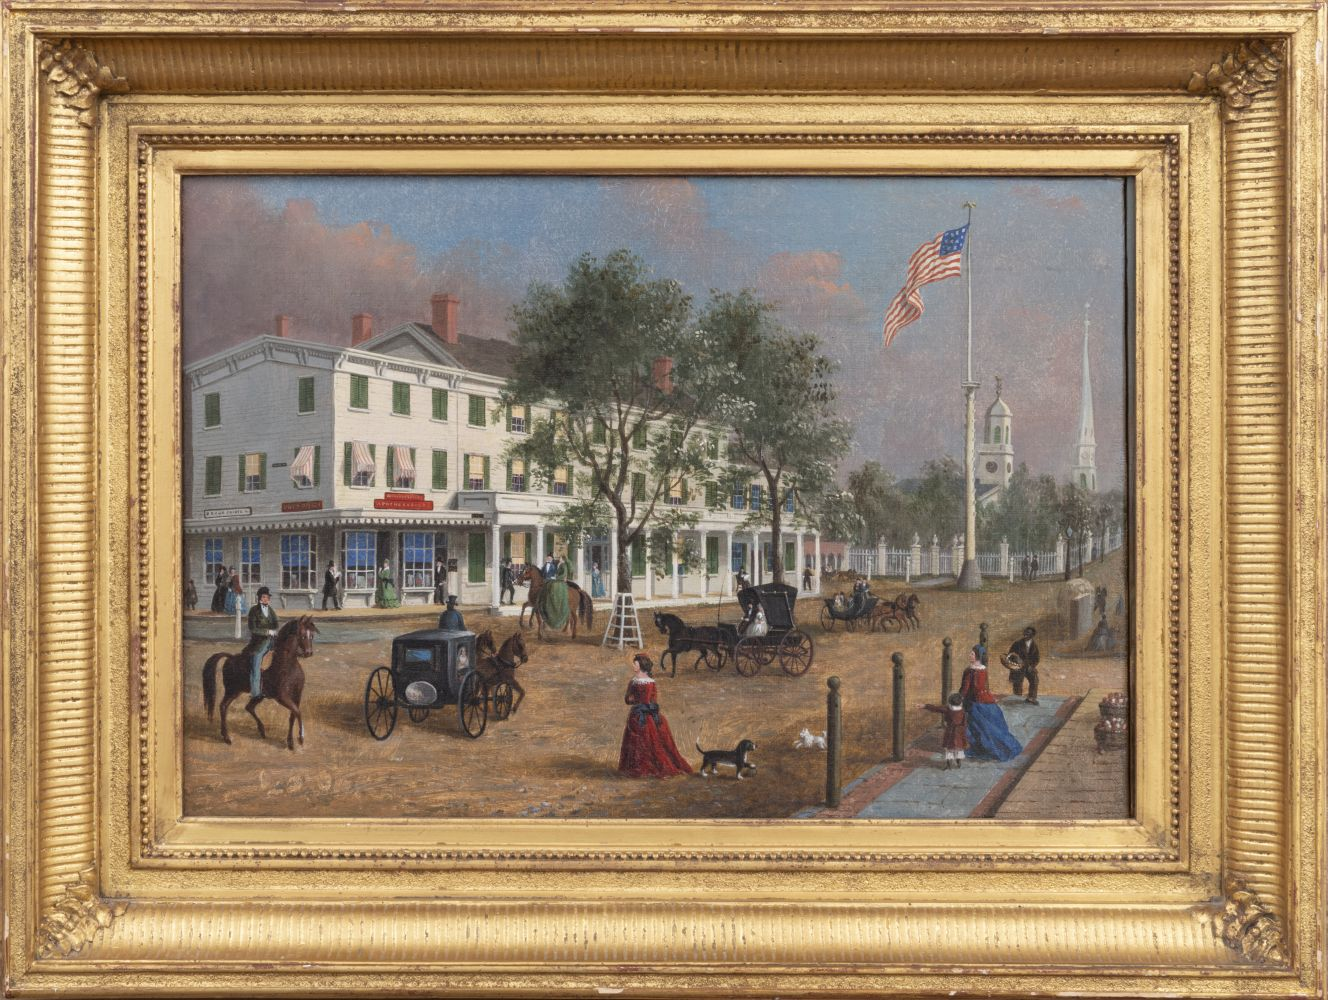 John Evers, Jr. (1794–1884). Northeast Corner, Front Street, Hempstead, New York, 1870. Oil on canvas, 12 x 17 in. Unsigned (framed)